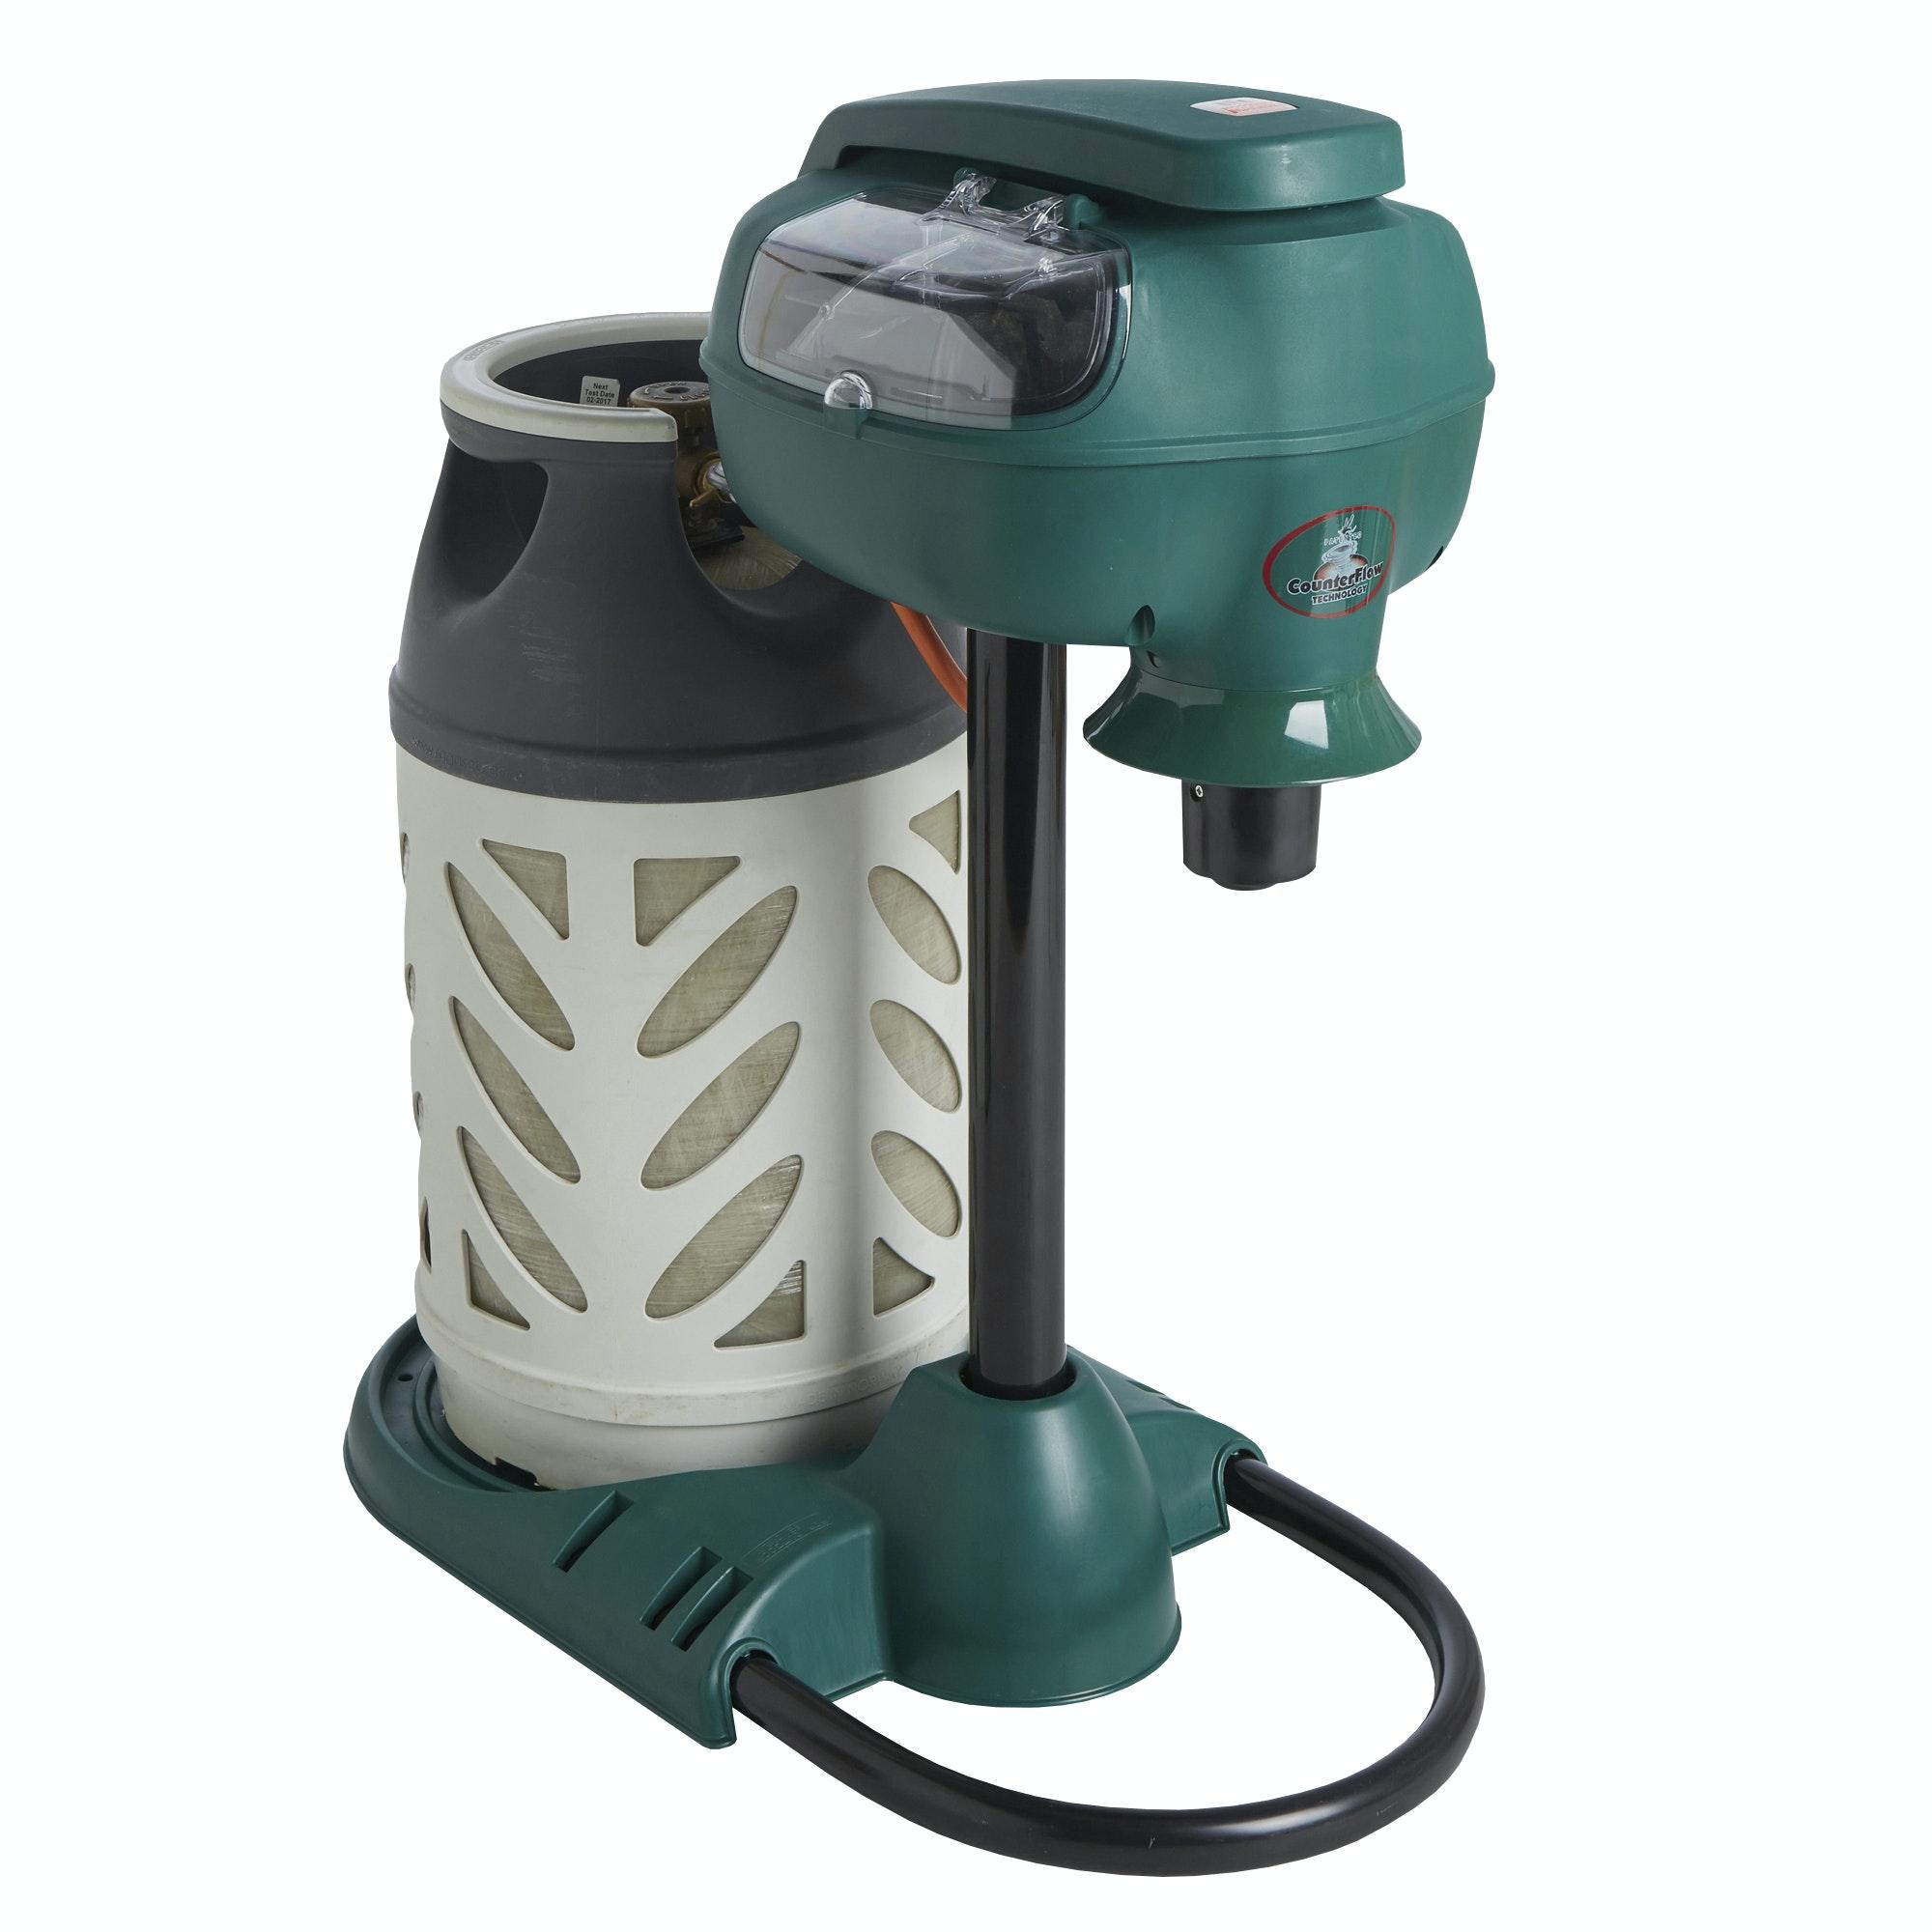 Myggfångare Acreto Mosquito Magnet Pioneer